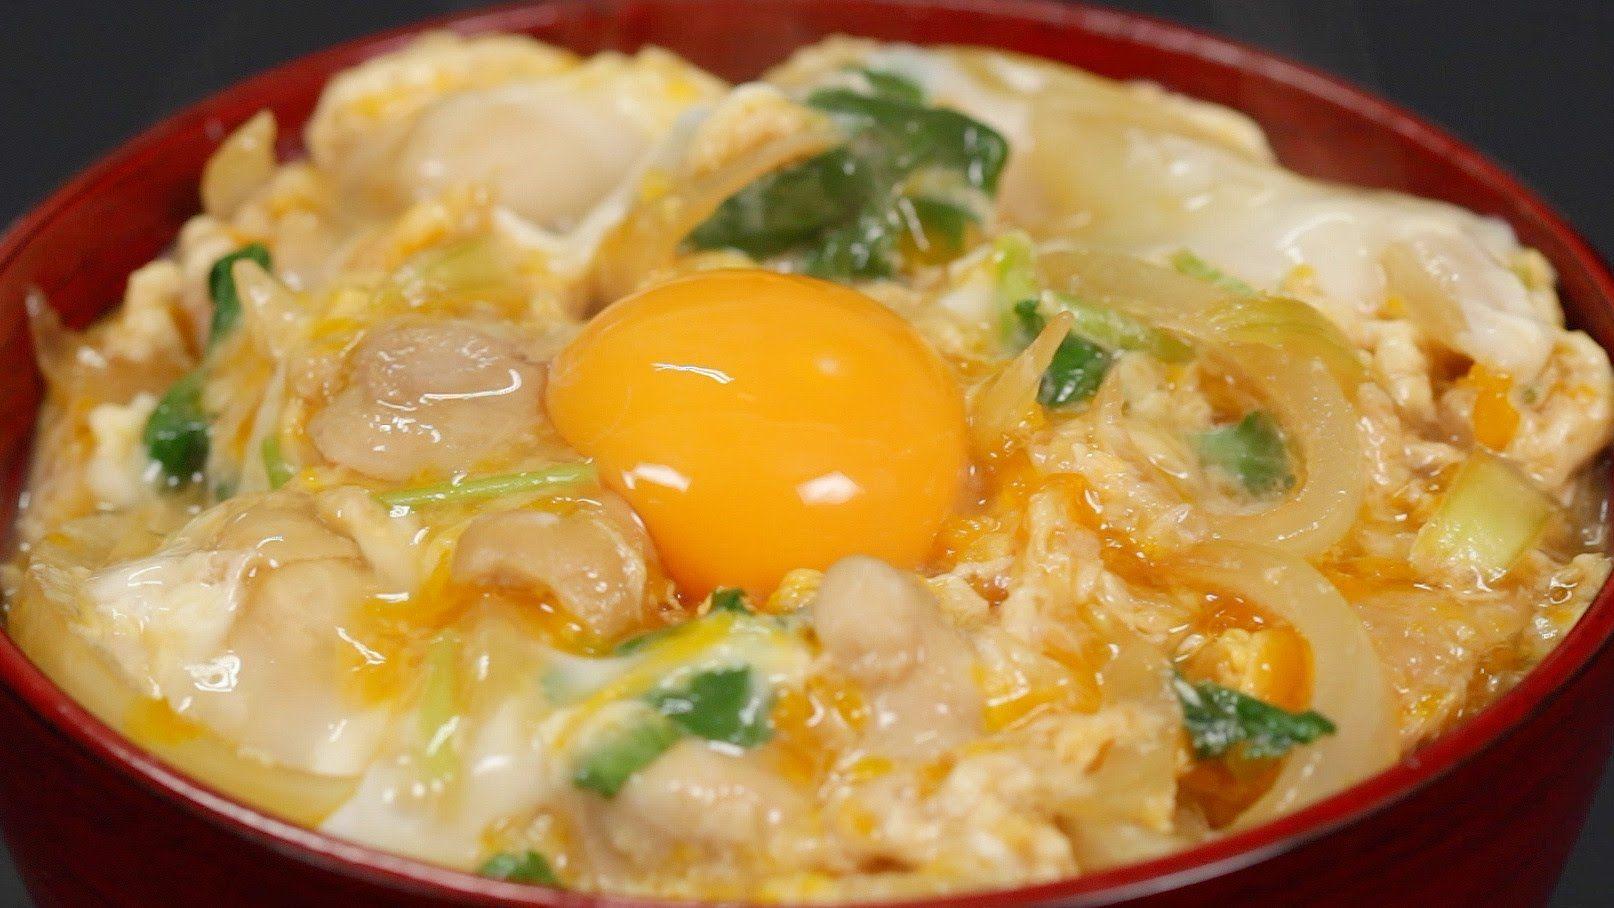 7 Makanan Jepang yang Punya Unsur Kata Don, Lalu Apa Bedanya?